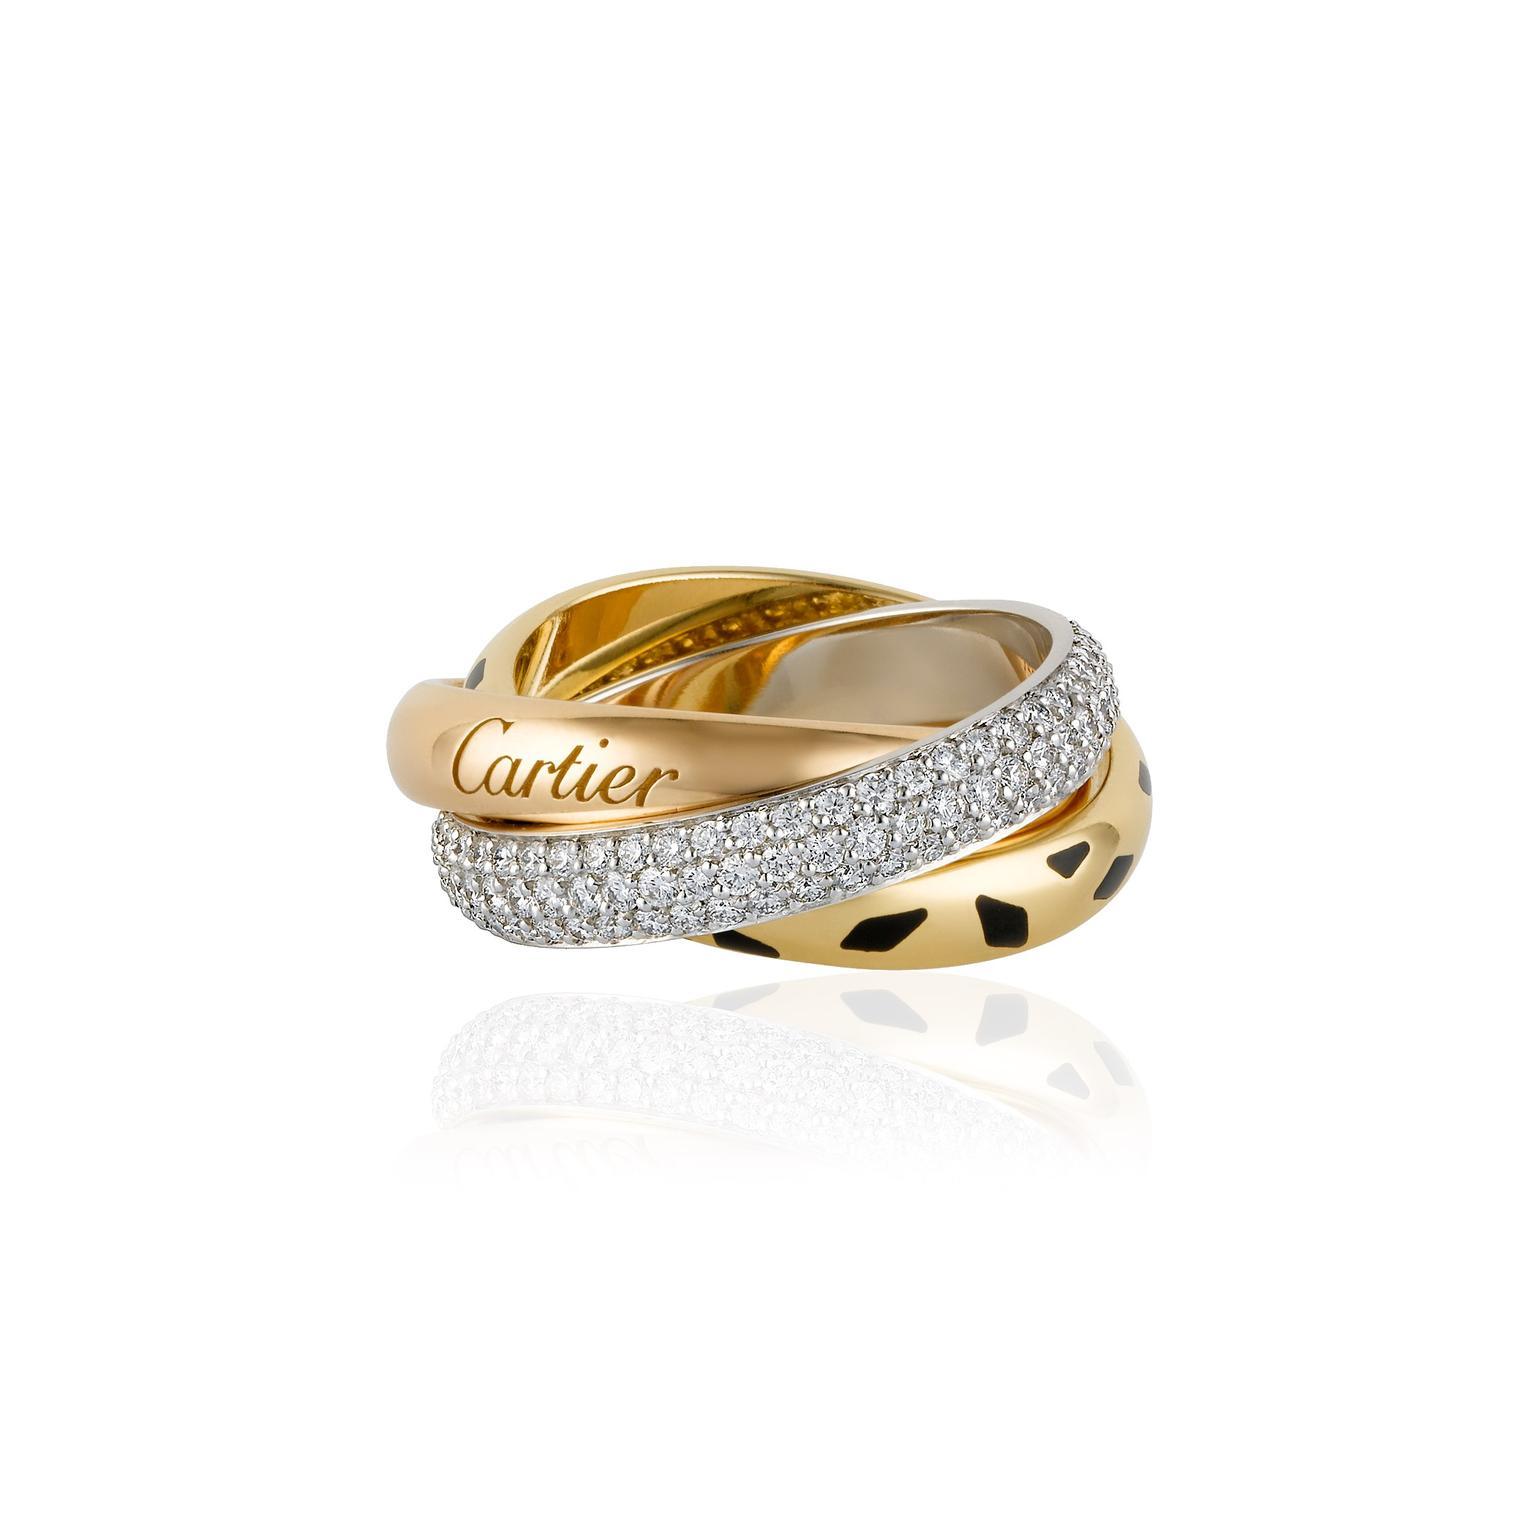 trinity sauvage gold and diamond ring cartier the jewellery editor